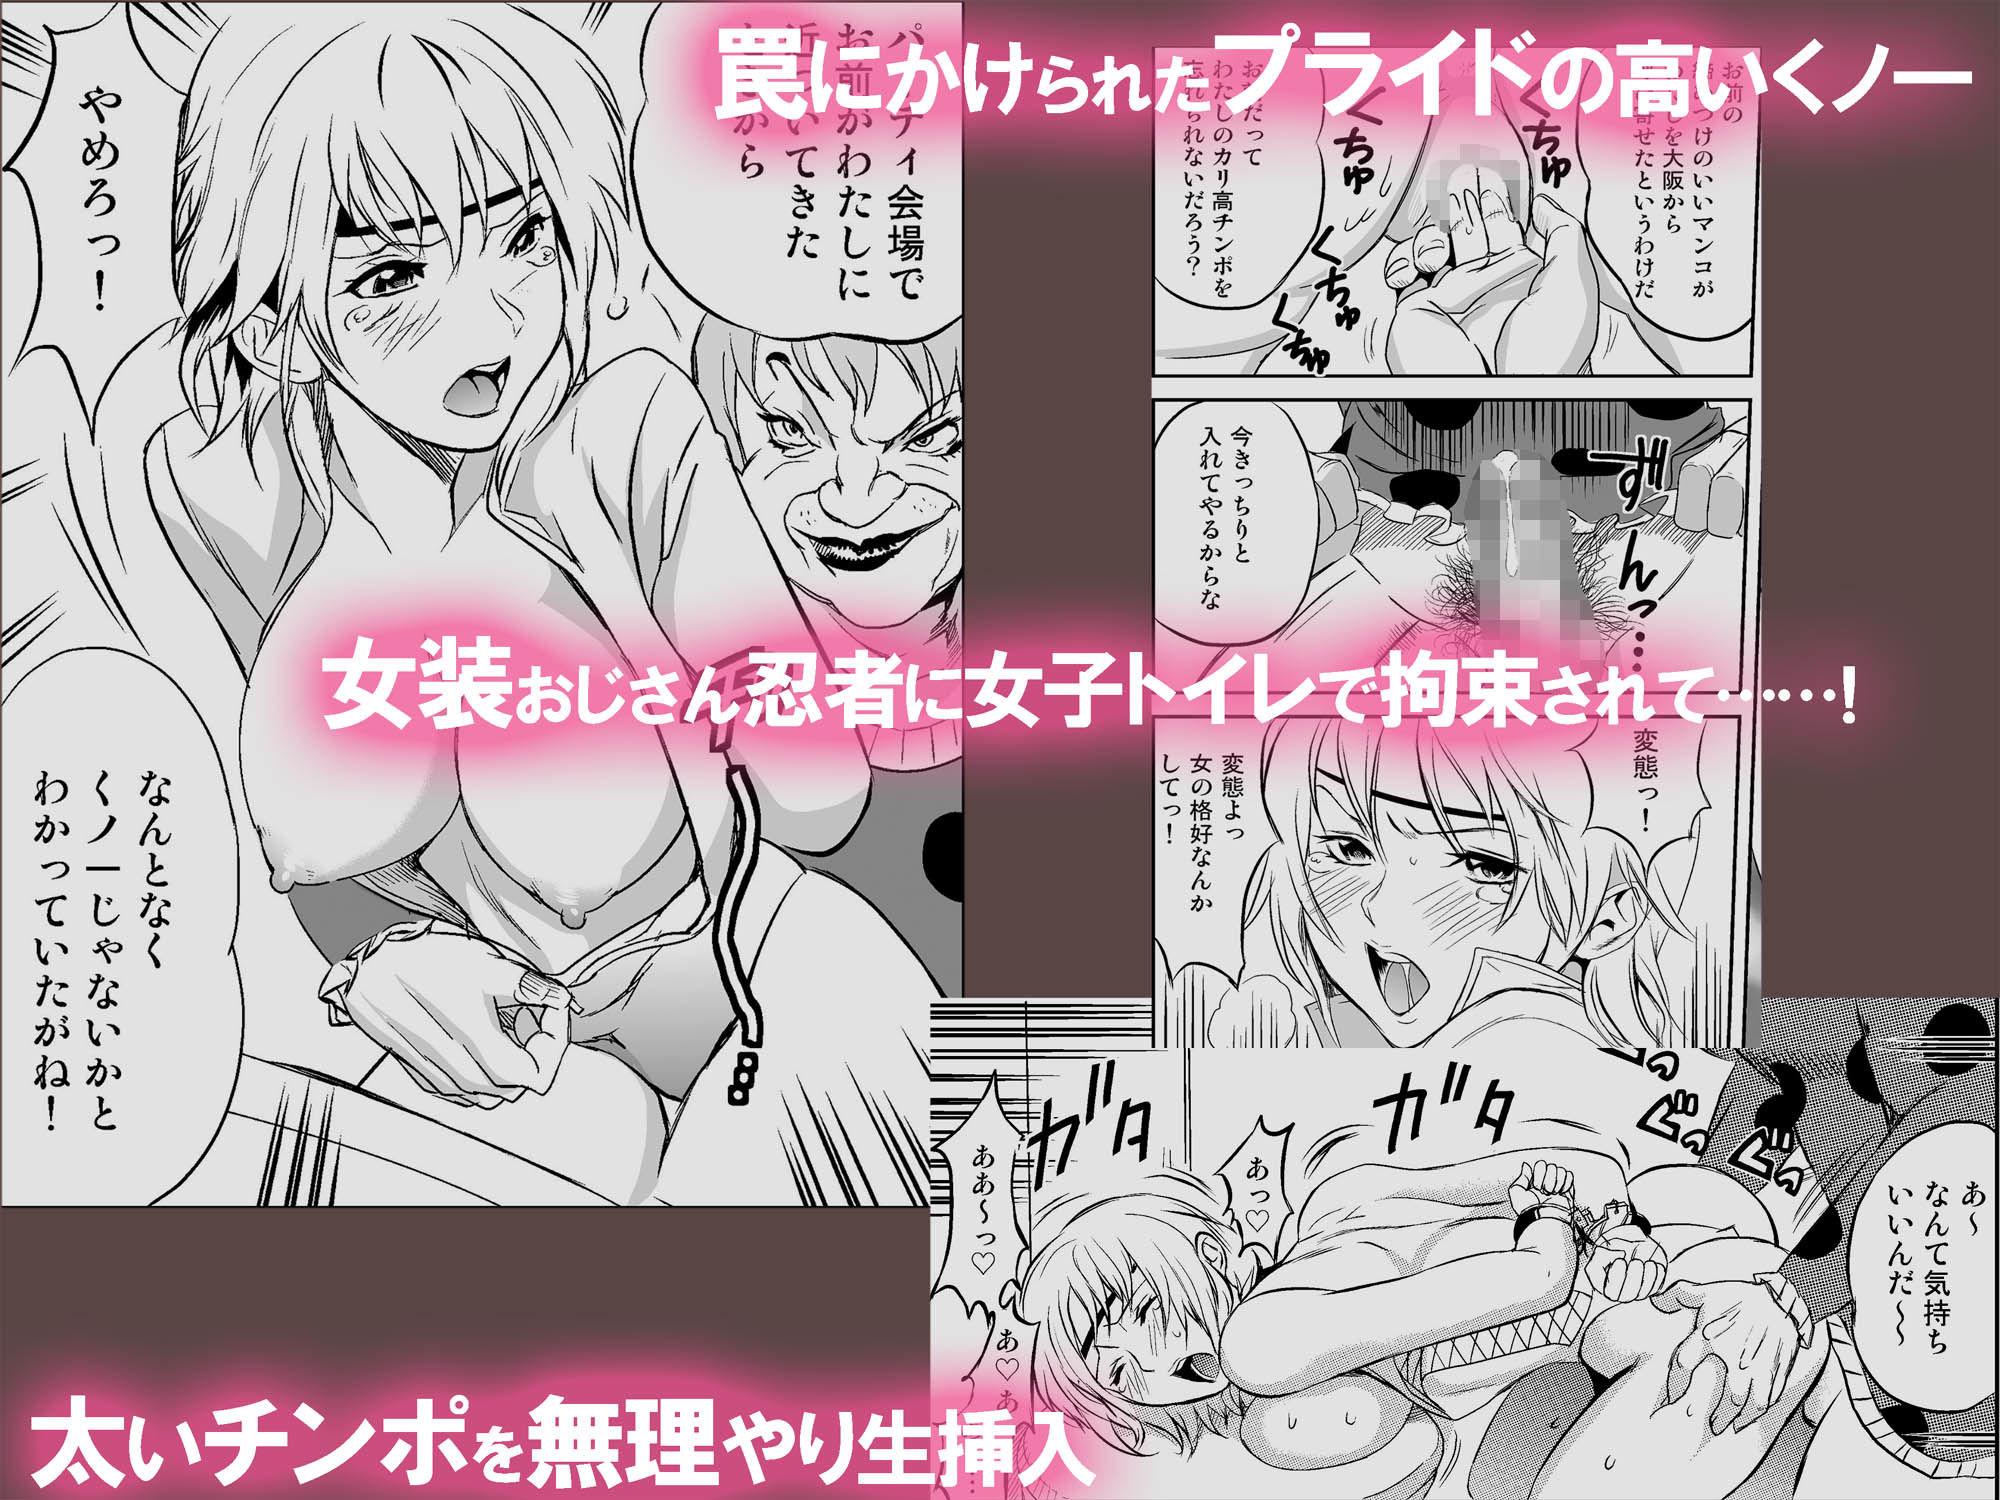 OL���ΰ� �ɤ����٥ߥå���� Vol.2 ���������Ȥ�������OL��櫤ˤ����äƽä��ߤ��������������� ����